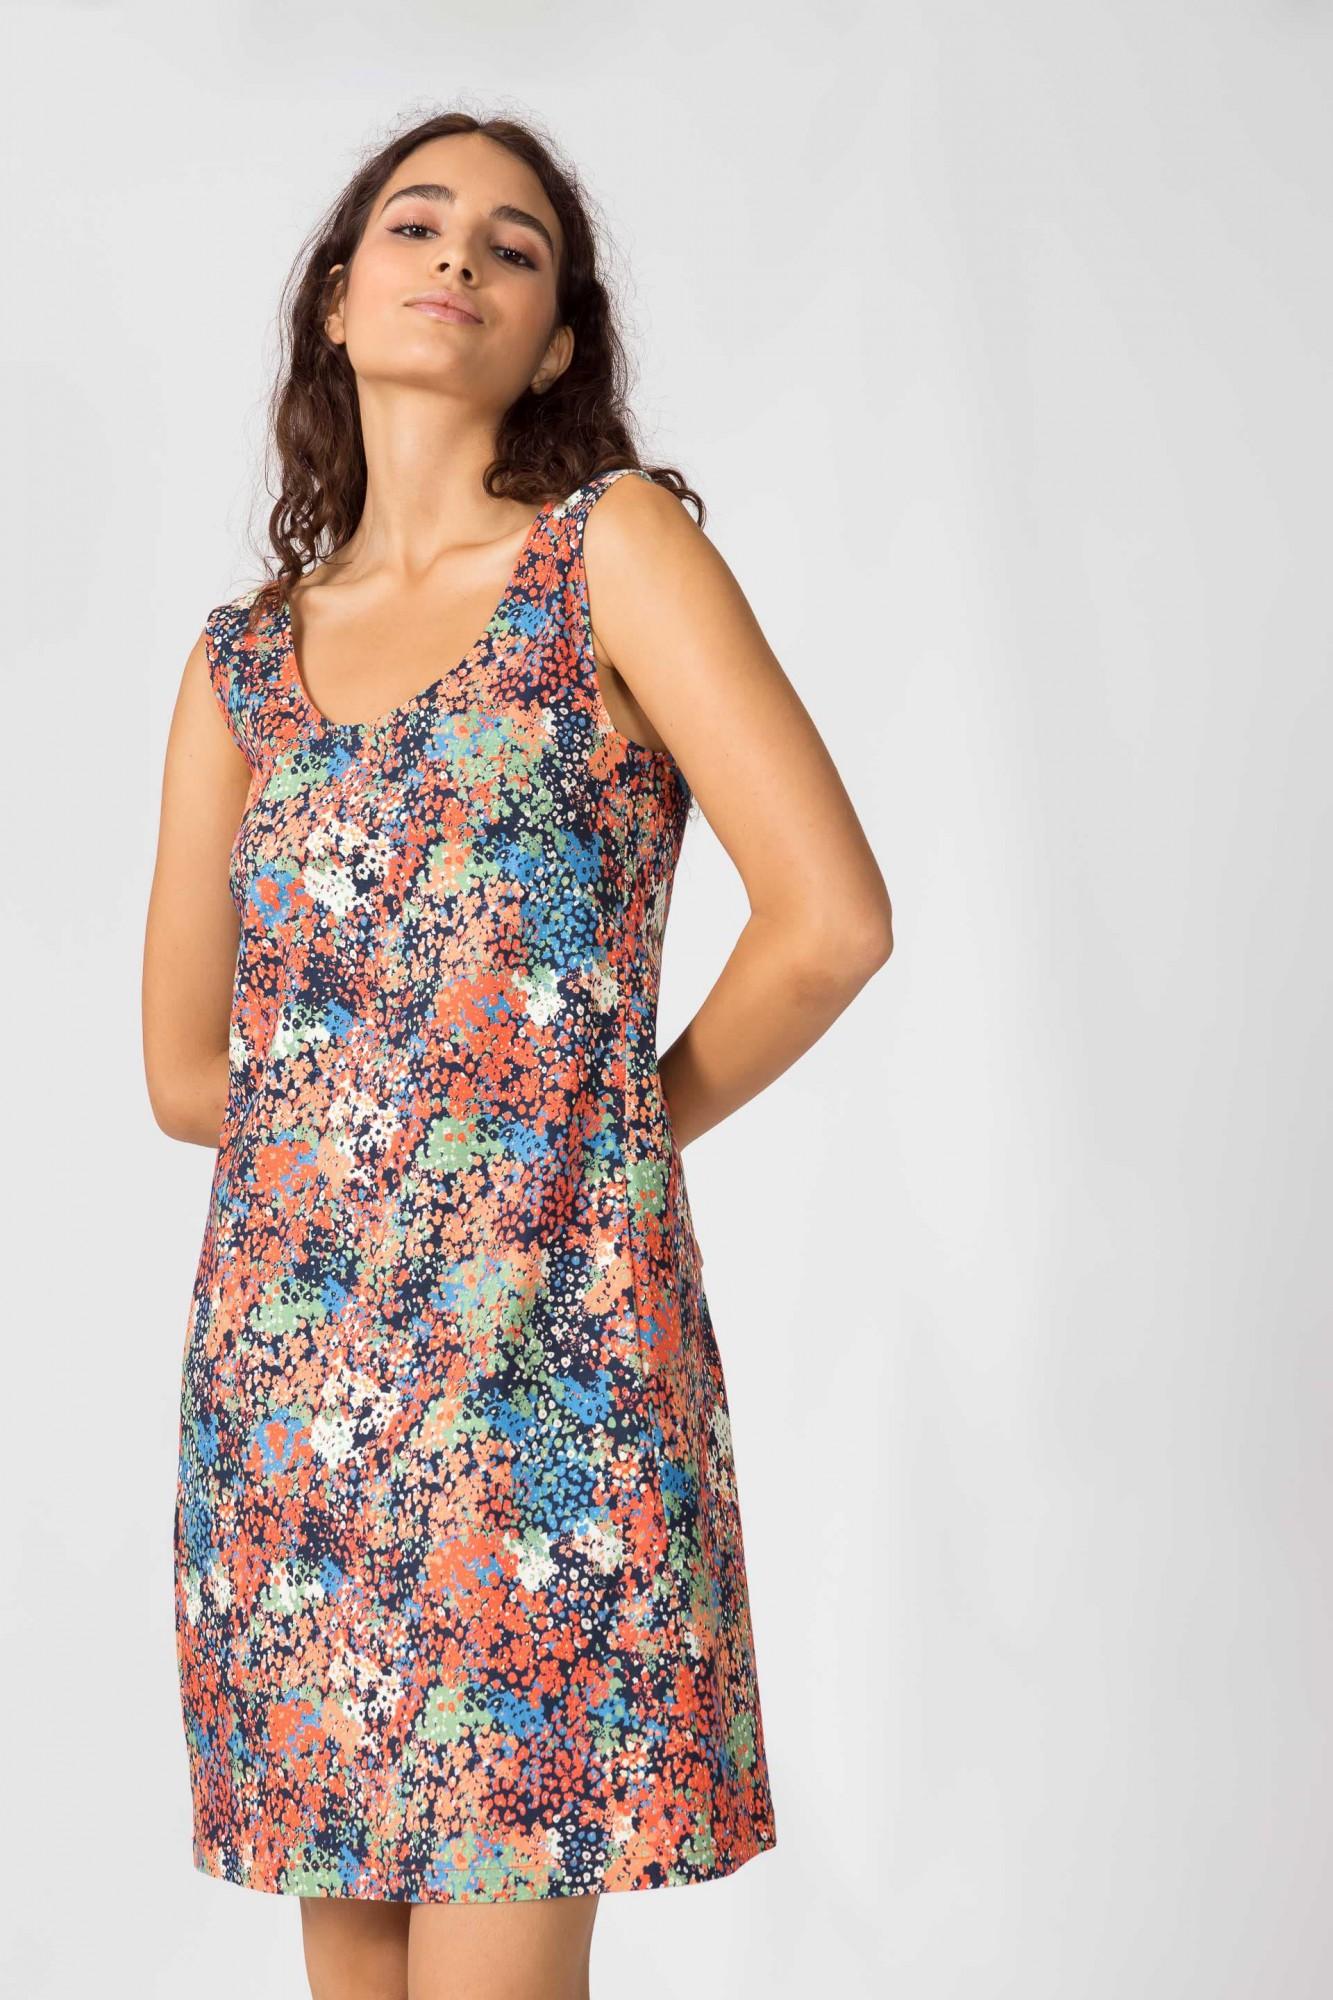 Robe fleurie sans manches SKFK, Bioleta